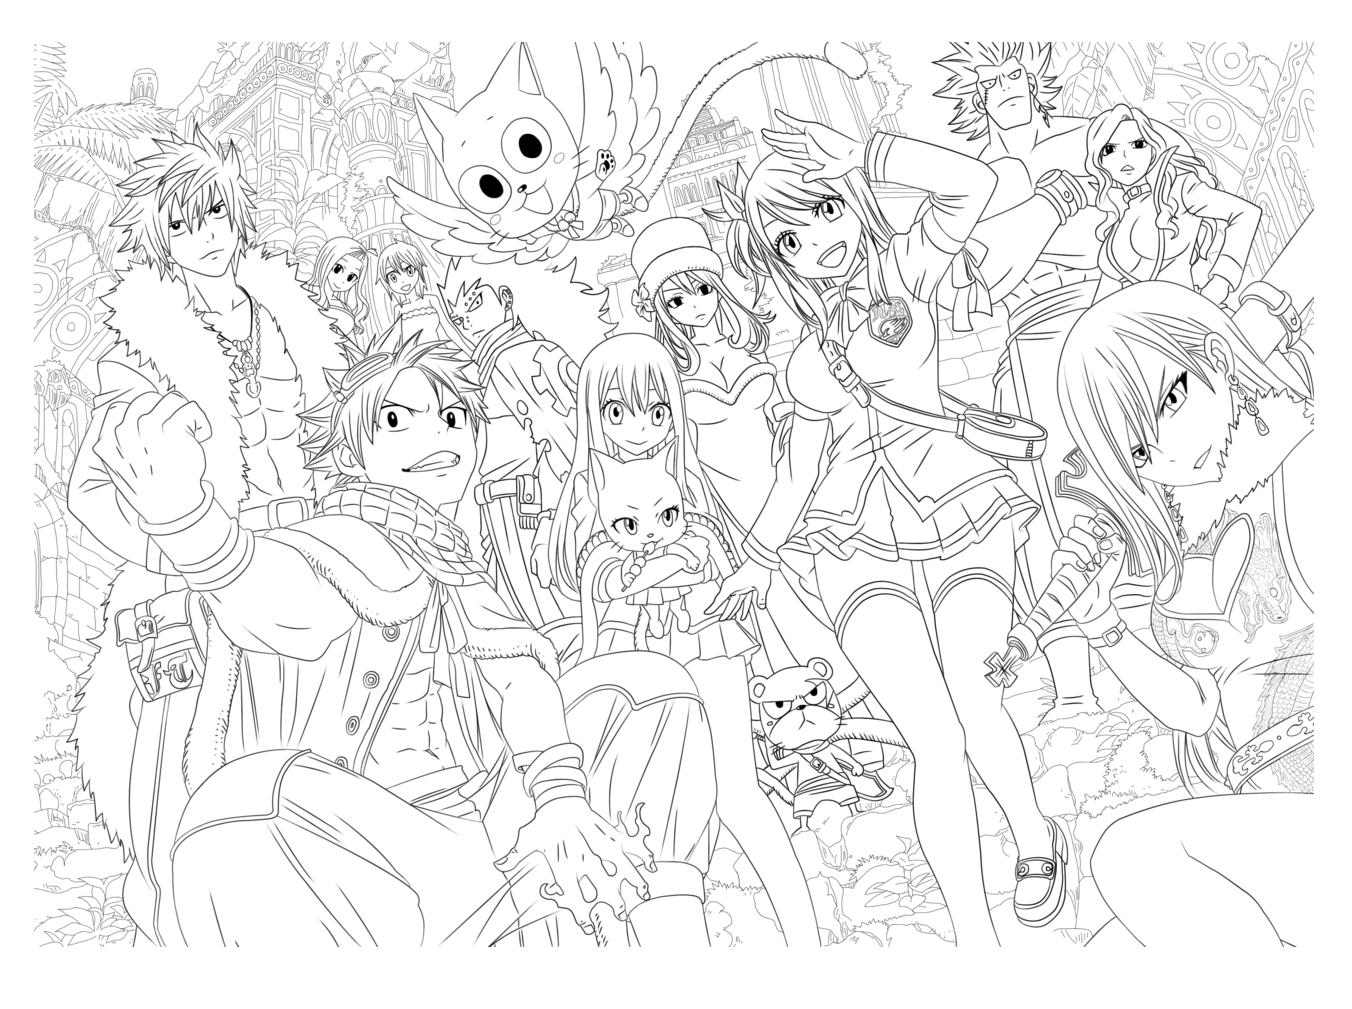 Dessin de manga difficile dessin de manga - Imprimer manga ...